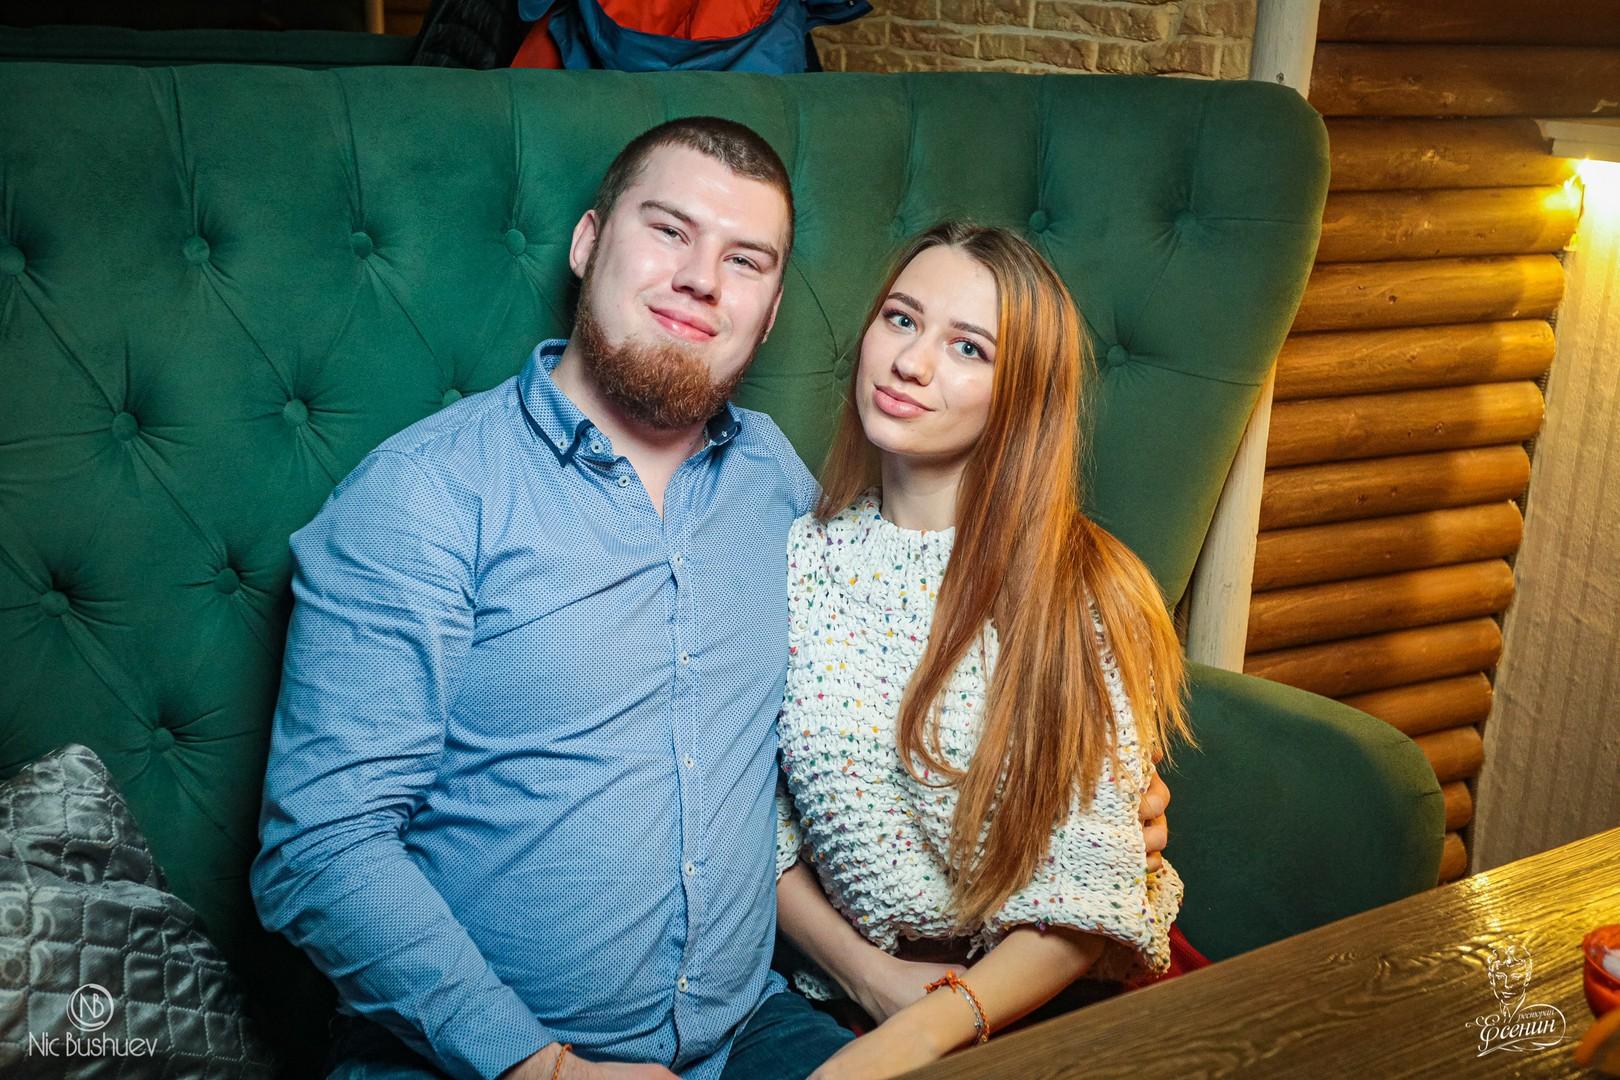 Ресторан Орехово-Зуево Есенин 14_02_2020 (16)